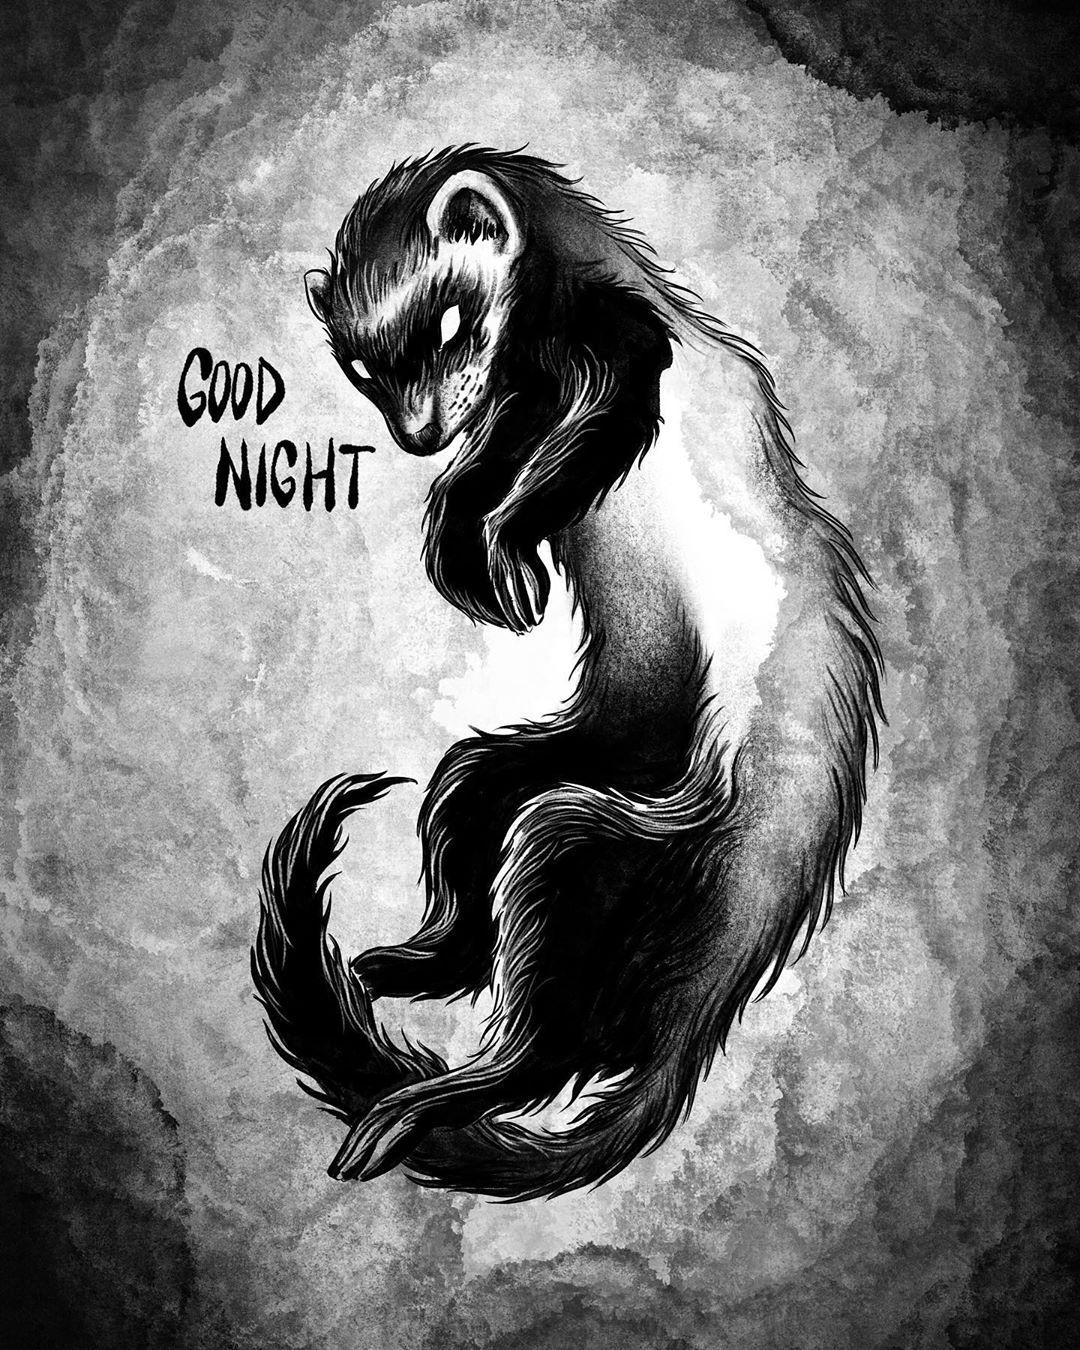 «Good night» - Not for sale, just to say goodbye to a small friend🤍 - #goodbye #goodnight #littlefriend #ferret #ferretlover #rip #loveyou #artwork #sadday #animallove #blackwork #darkwork #tattooart #tattoo #illustration